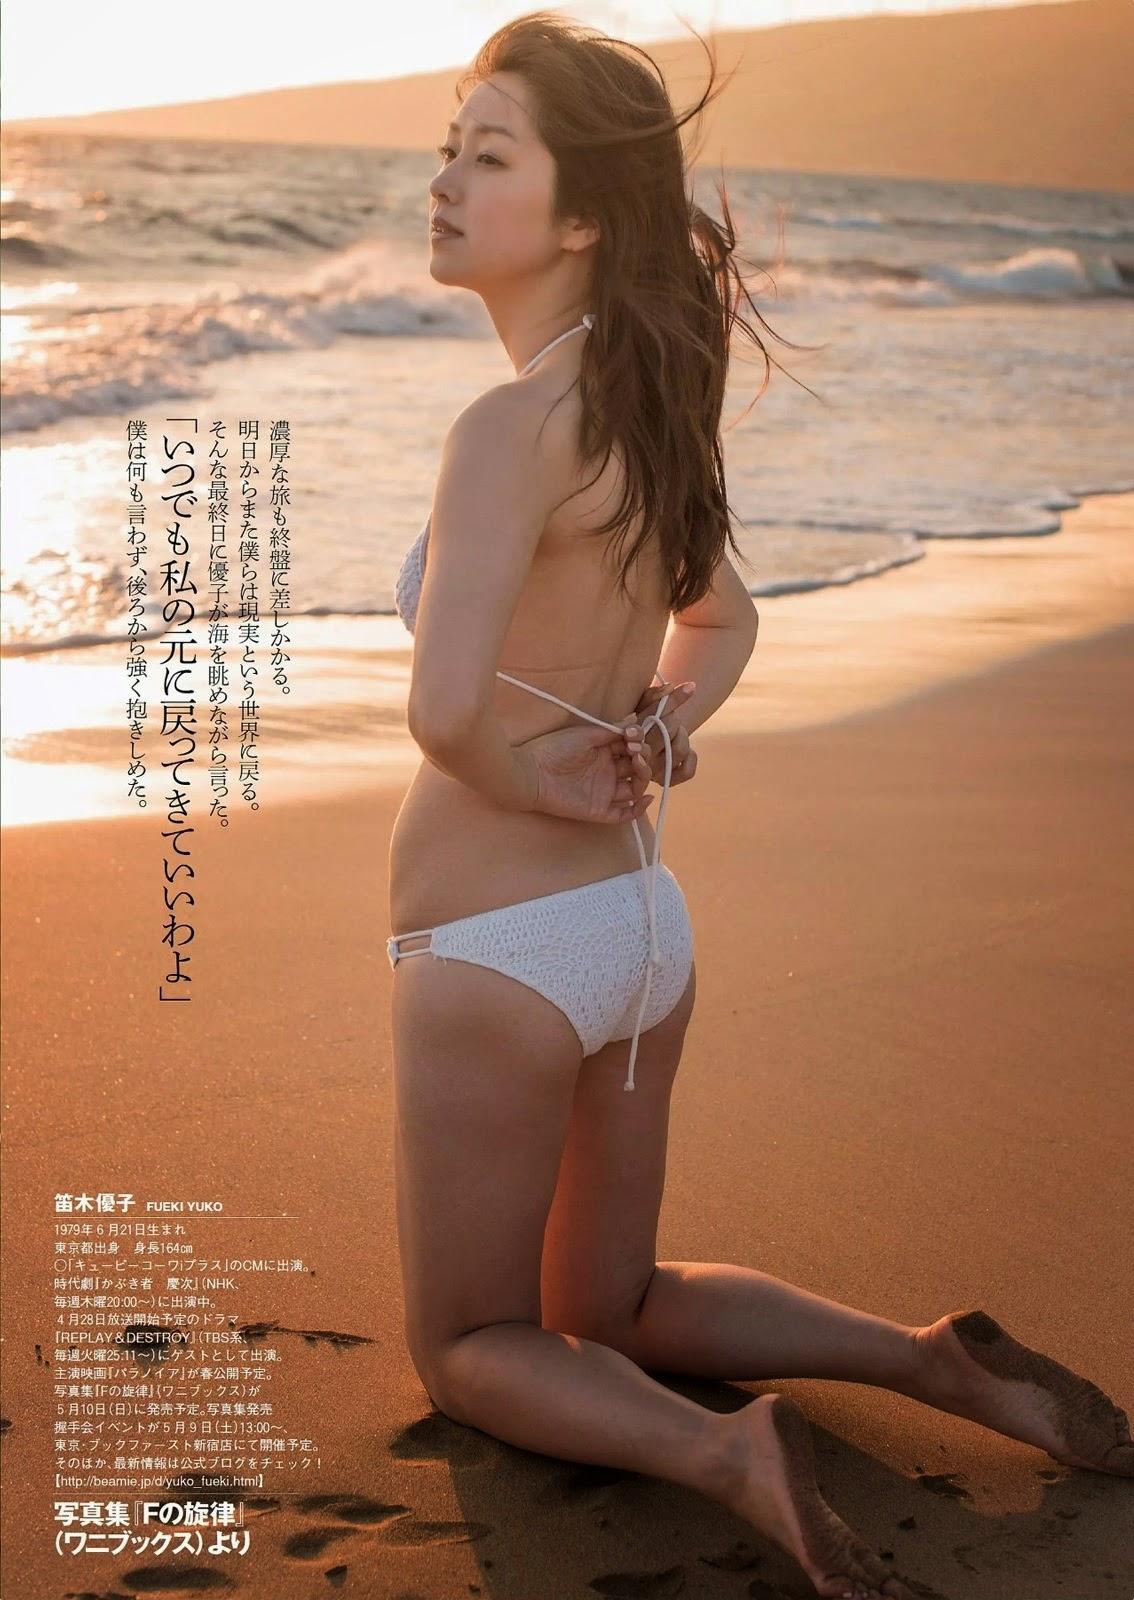 Fueki Yuko 笛木優子 유민 Weekly Playboy 週刊プレイボーイ April 2015 Pictures 6